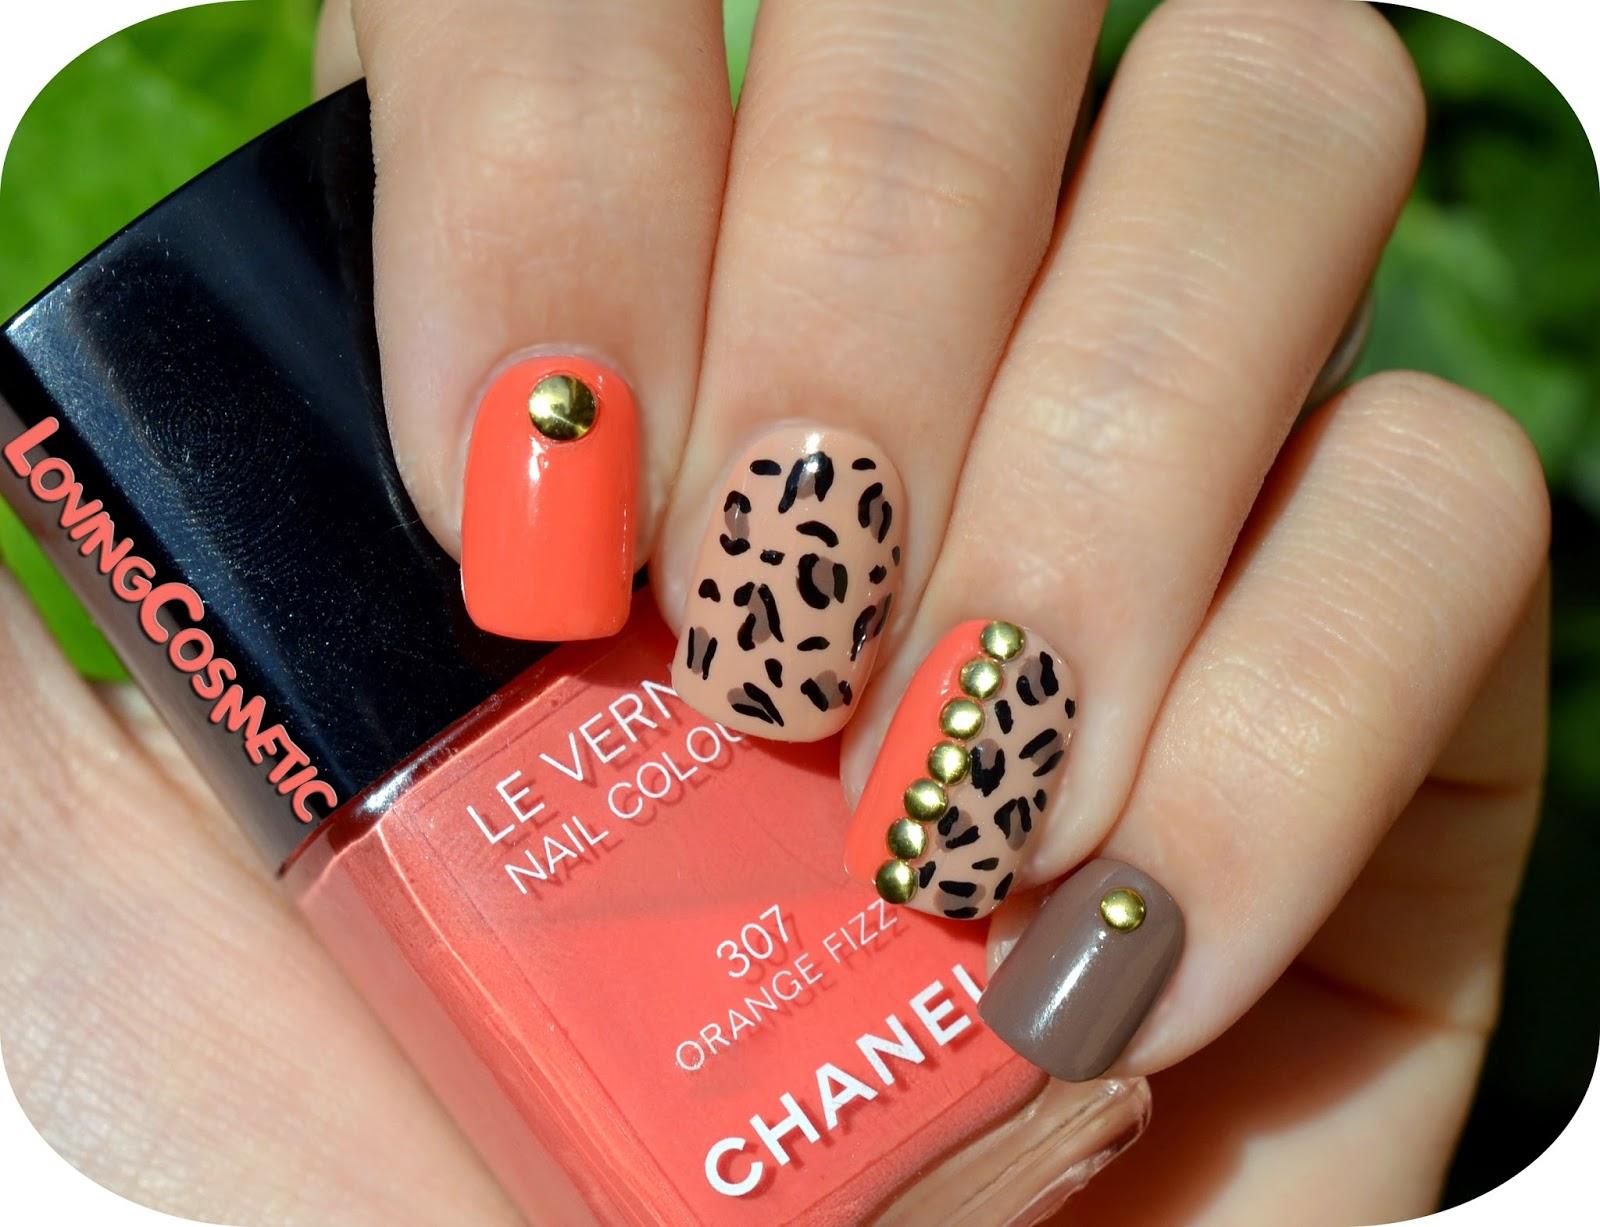 nail art nail diseño uñas mano alzada animal print chanel orange fizz 307 chanel 219 gosh tachuelas rhinestones bornprettystore lovingcosmetic loving cosmetic uña uñas cute design